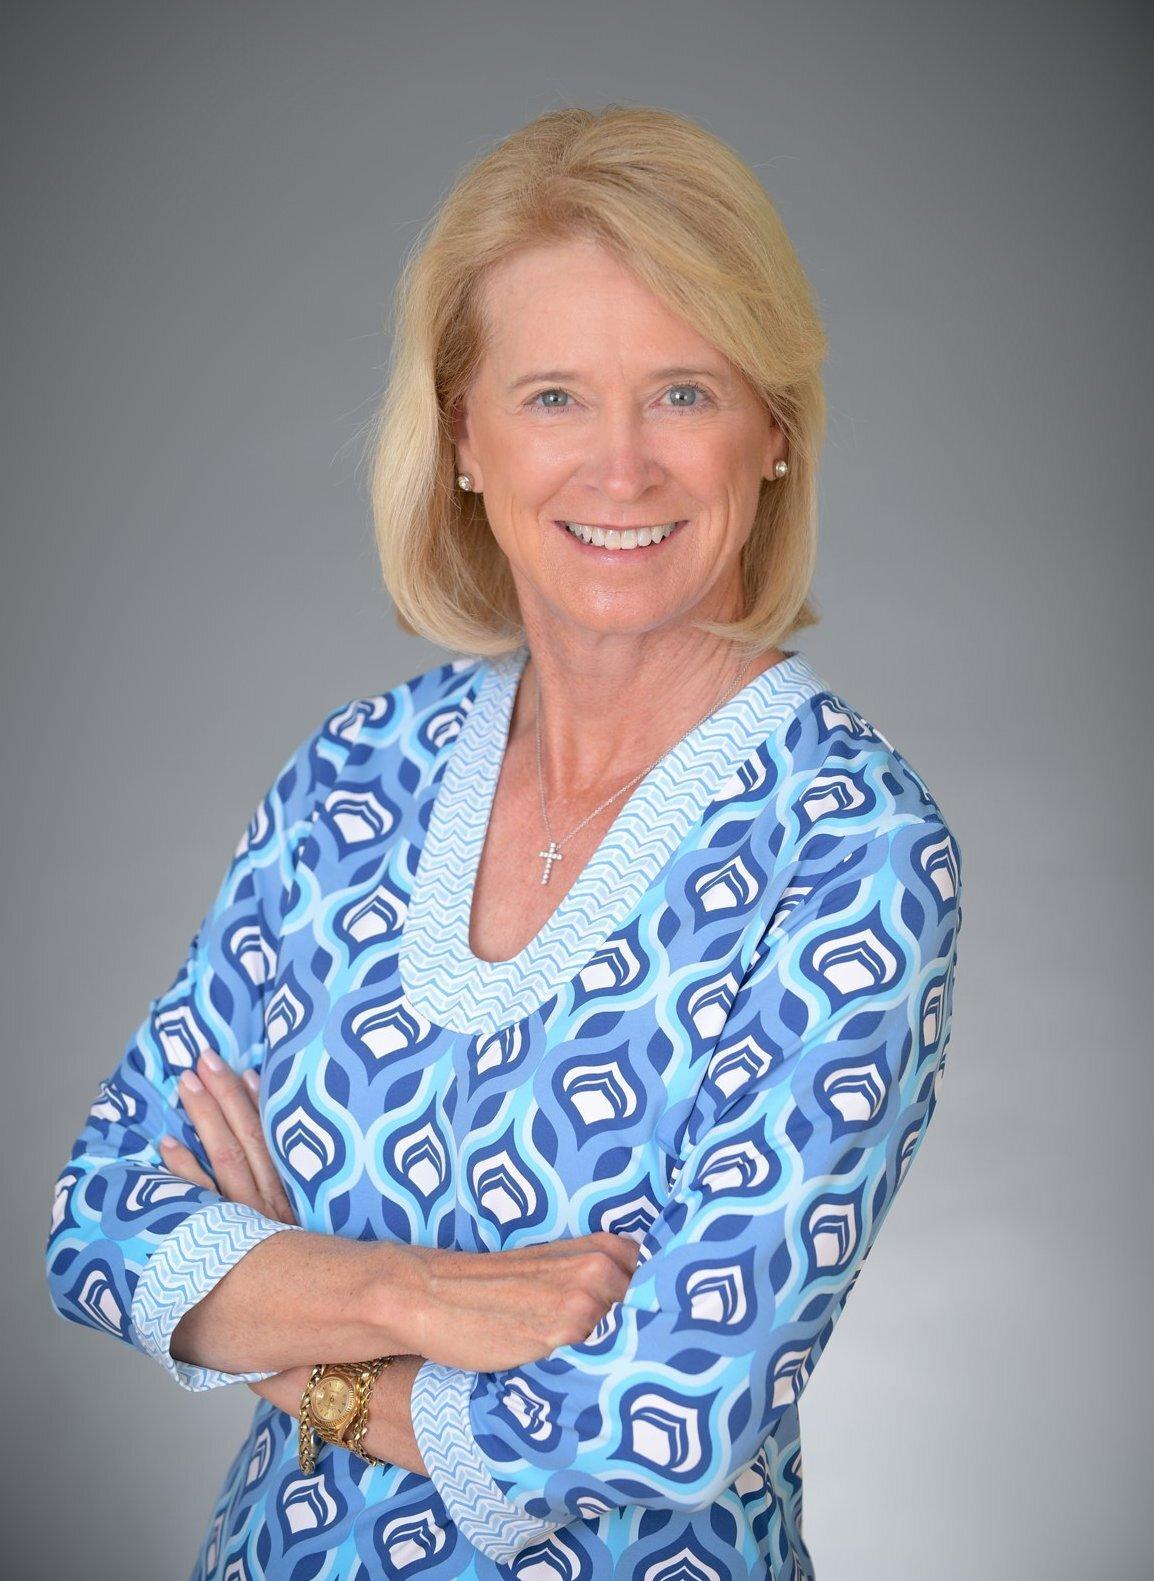 Cathy Richey - Outreach Director